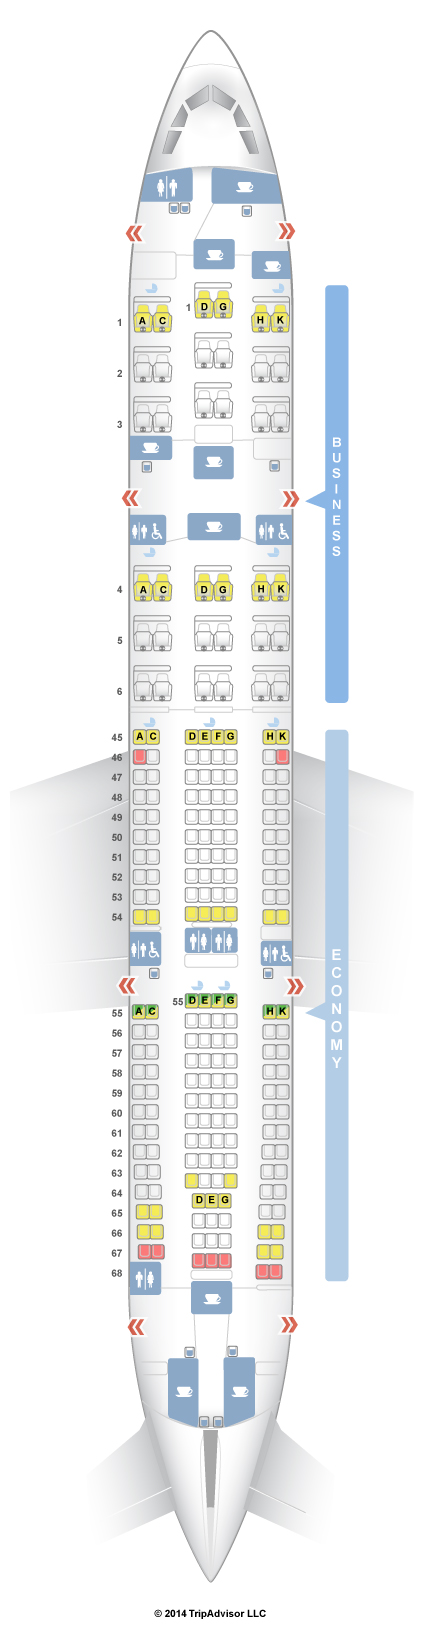 Seatguru Seat Map South African Airways Airbus A330 200 332